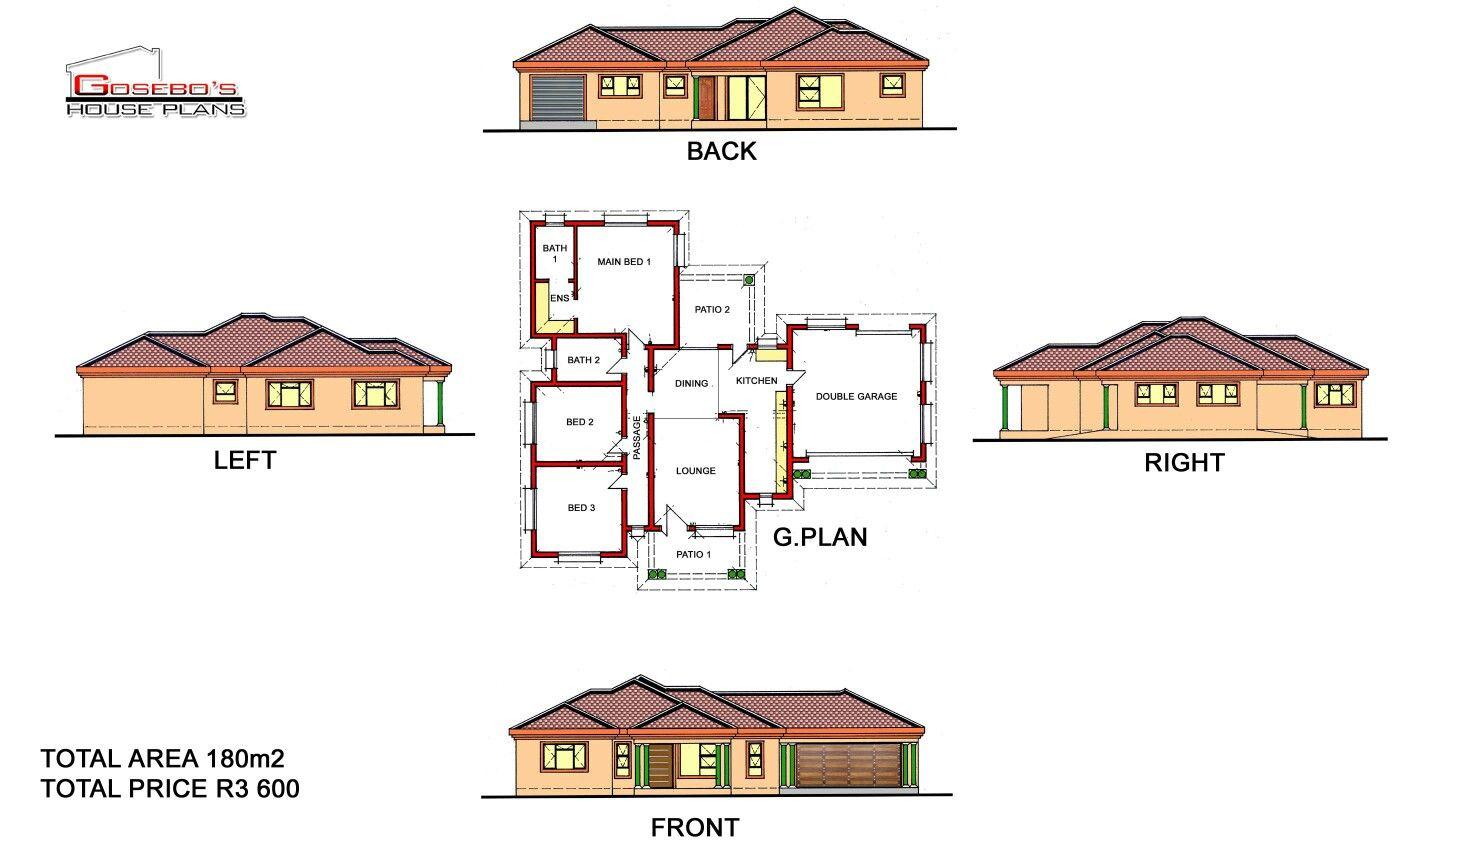 Pin By Gosebo House Plans On Gosebo House Plans House Plans South Africa House Plans House Plan Gallery